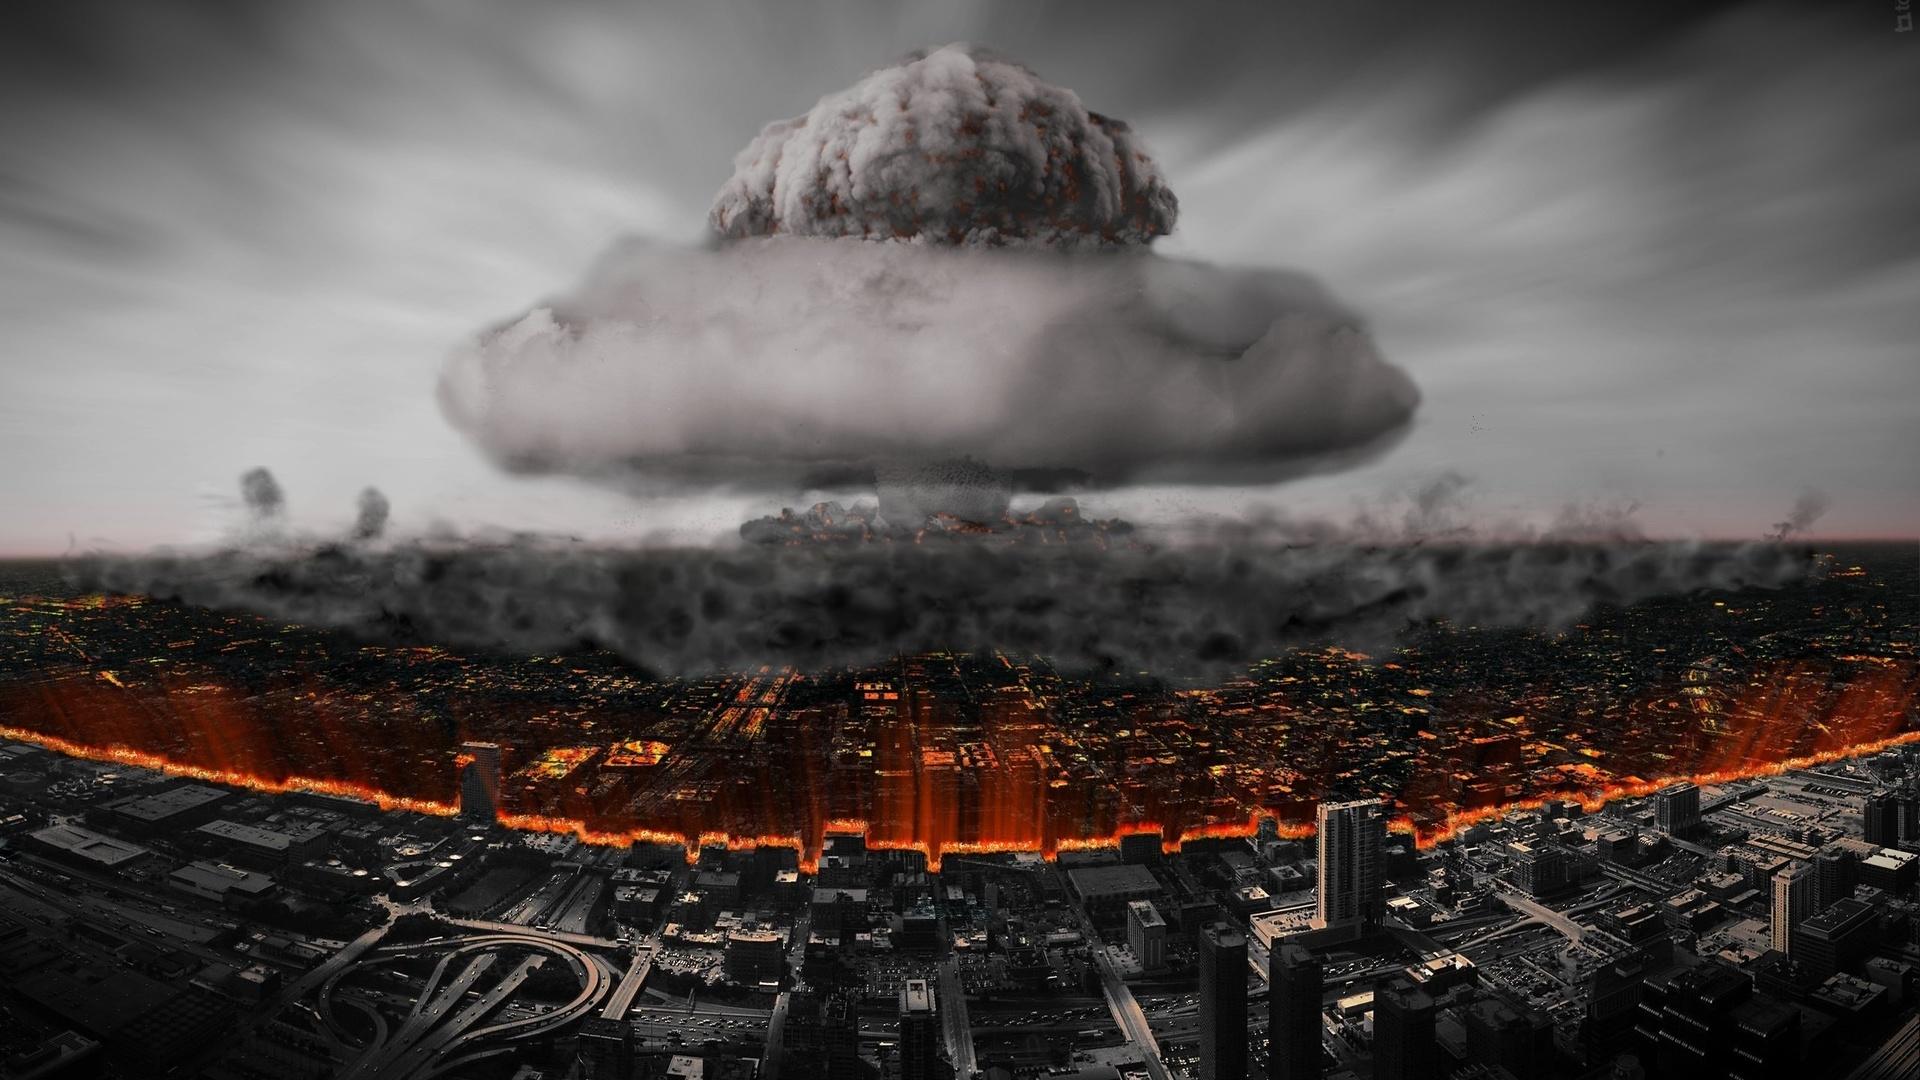 Картинка катастрофа на земле